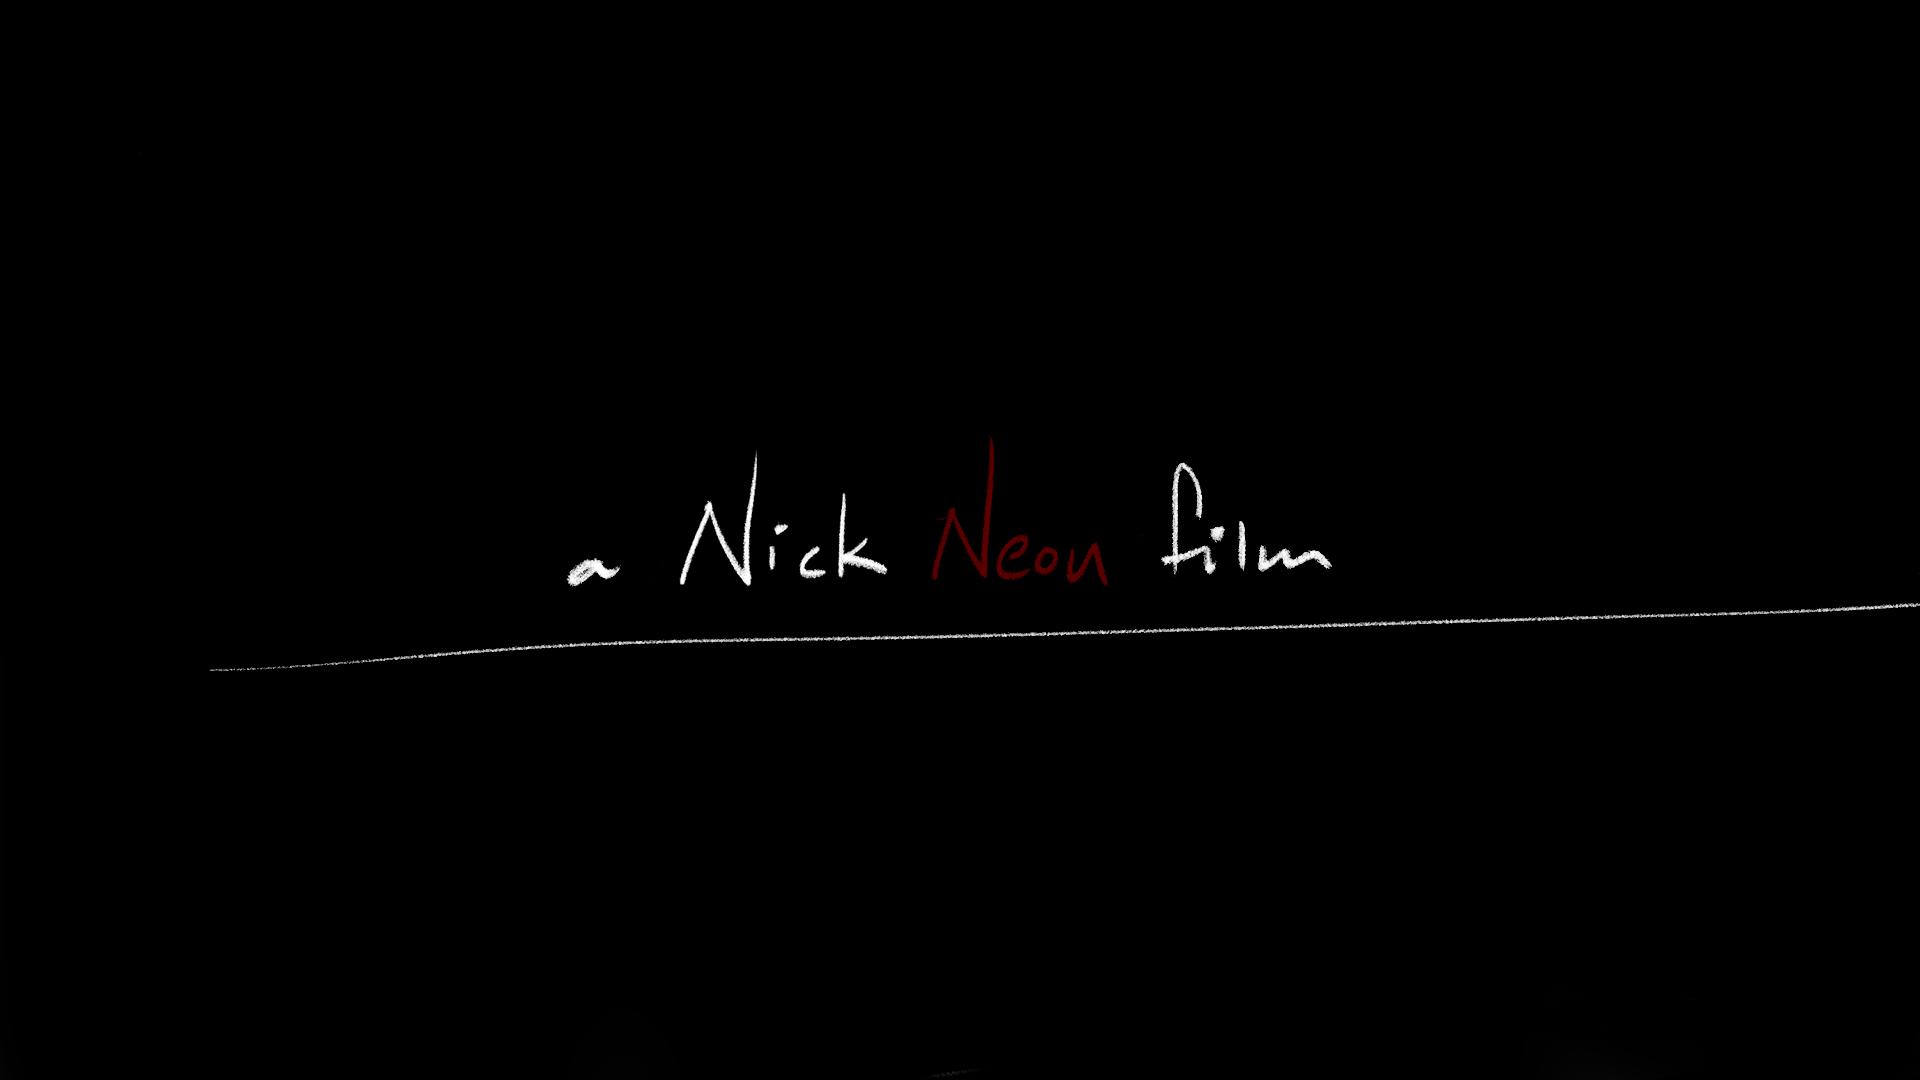 Nick Neon film.jpg